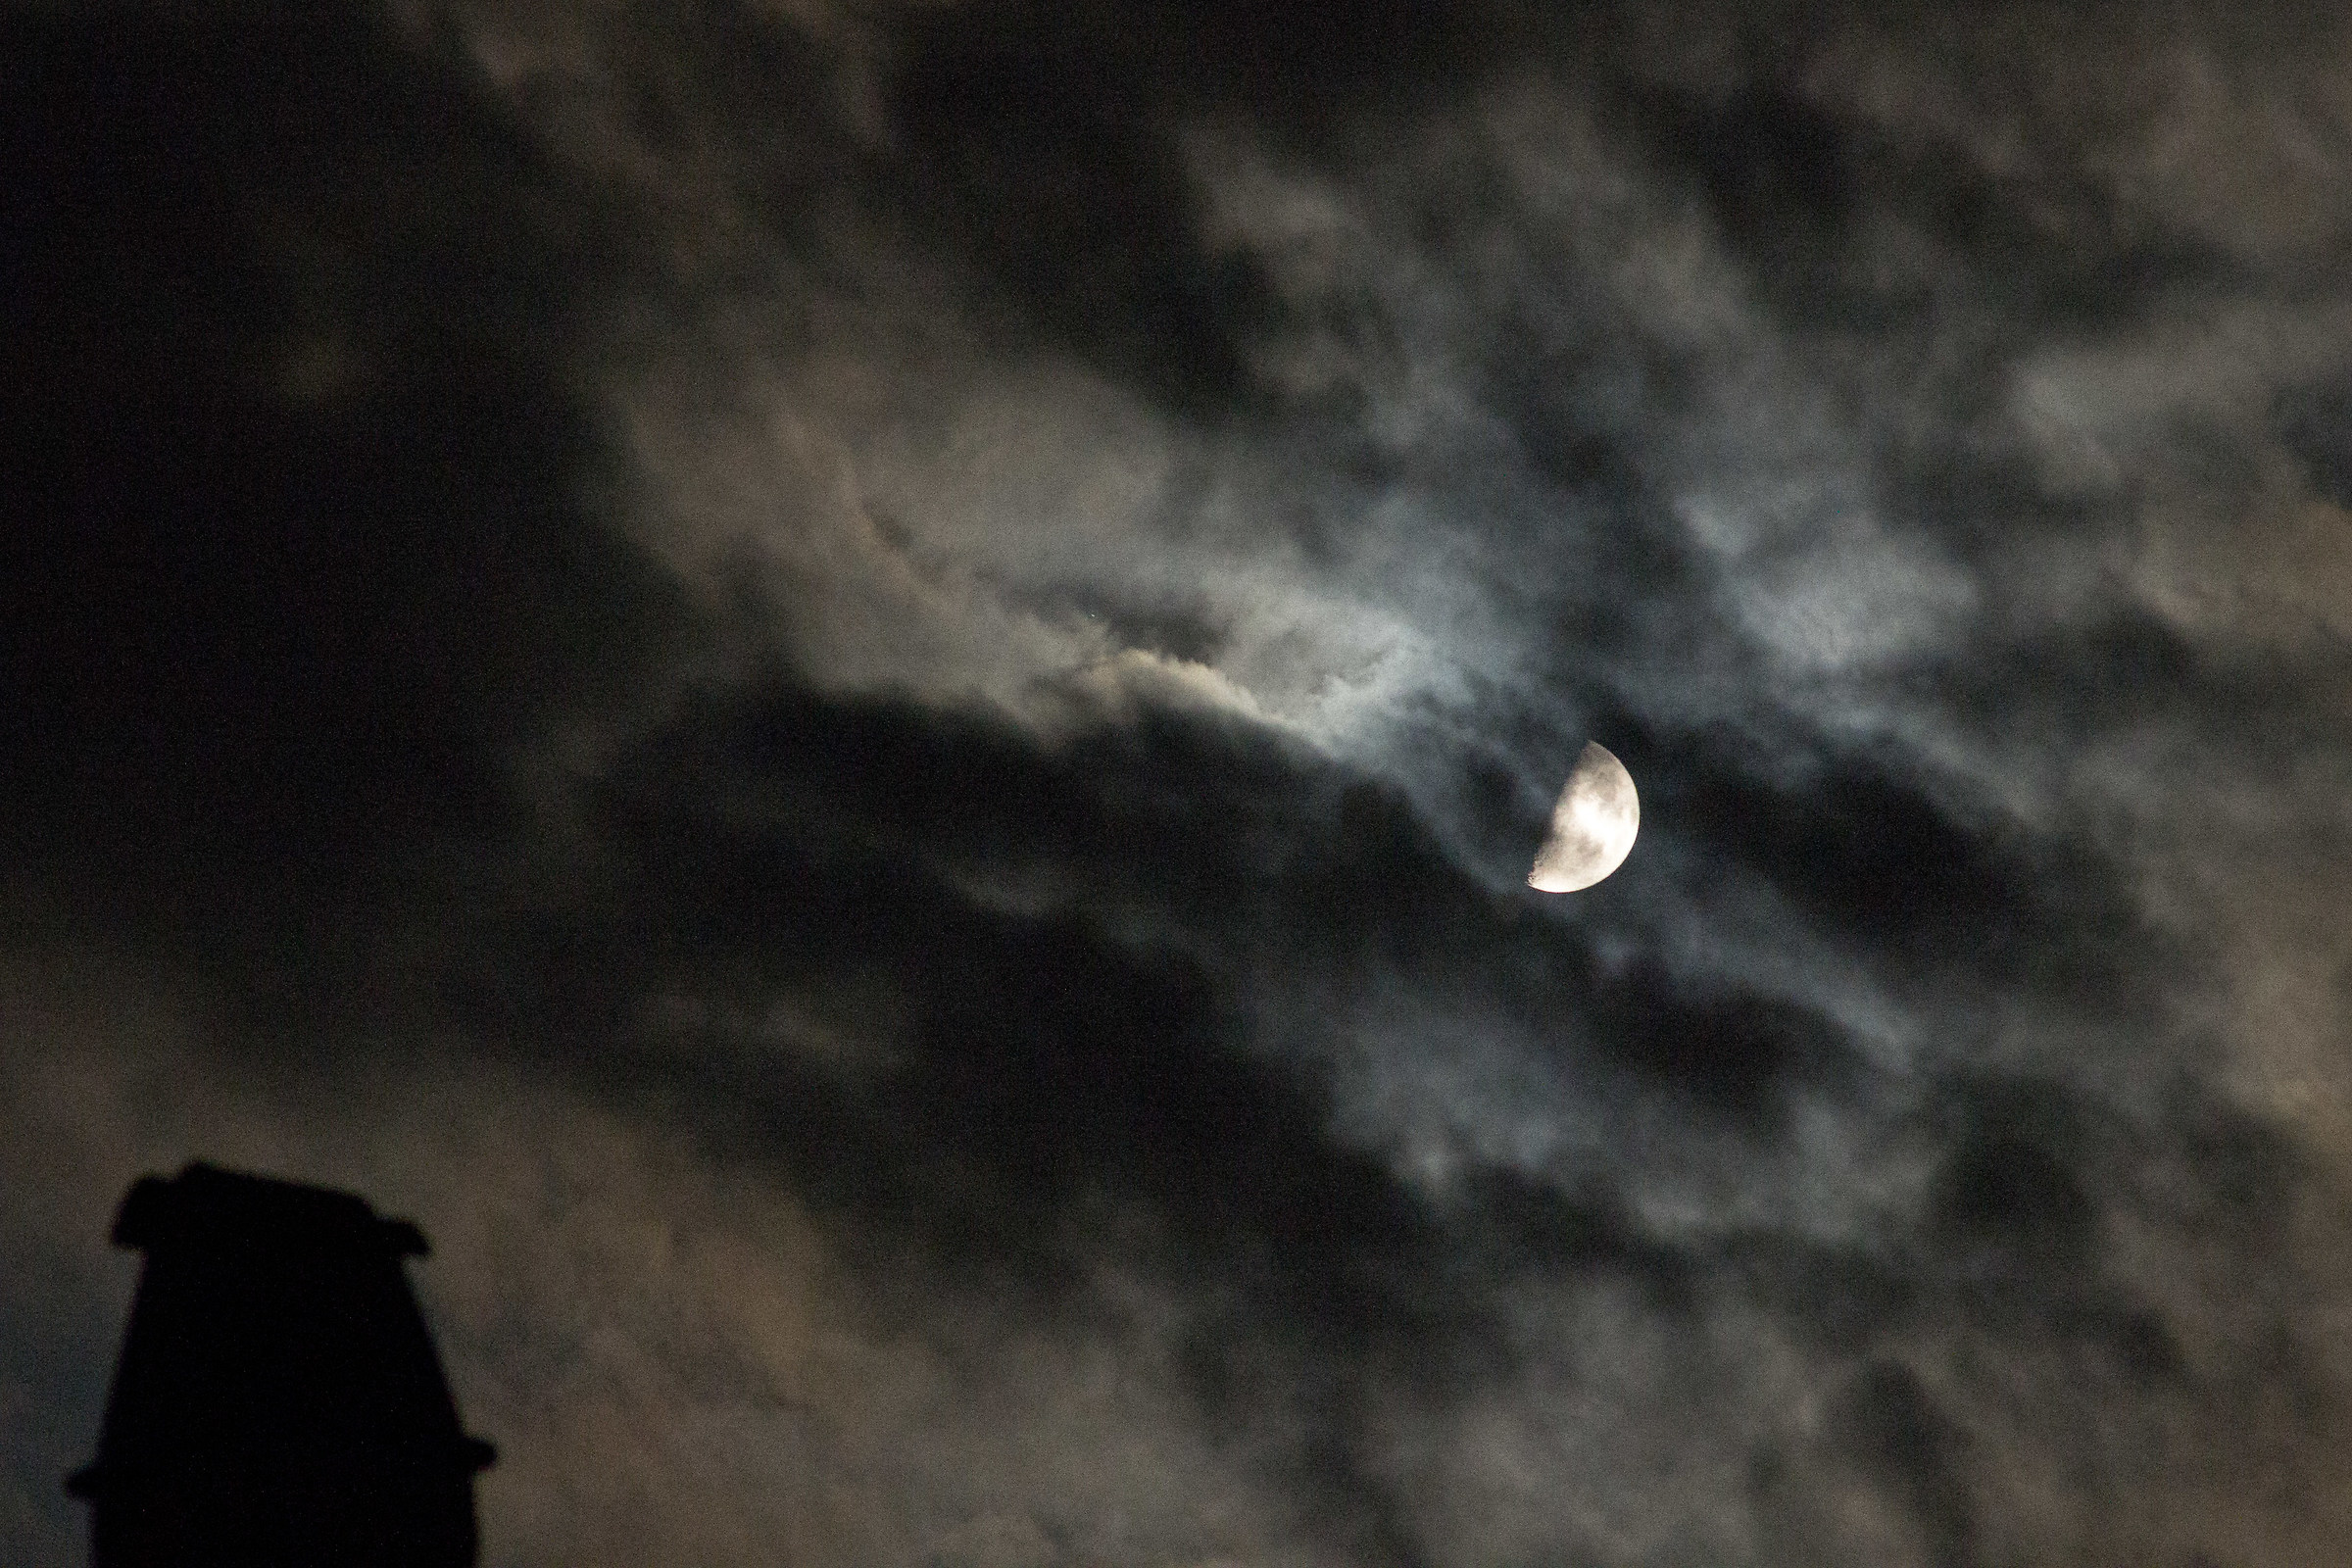 Moon & fireplace...